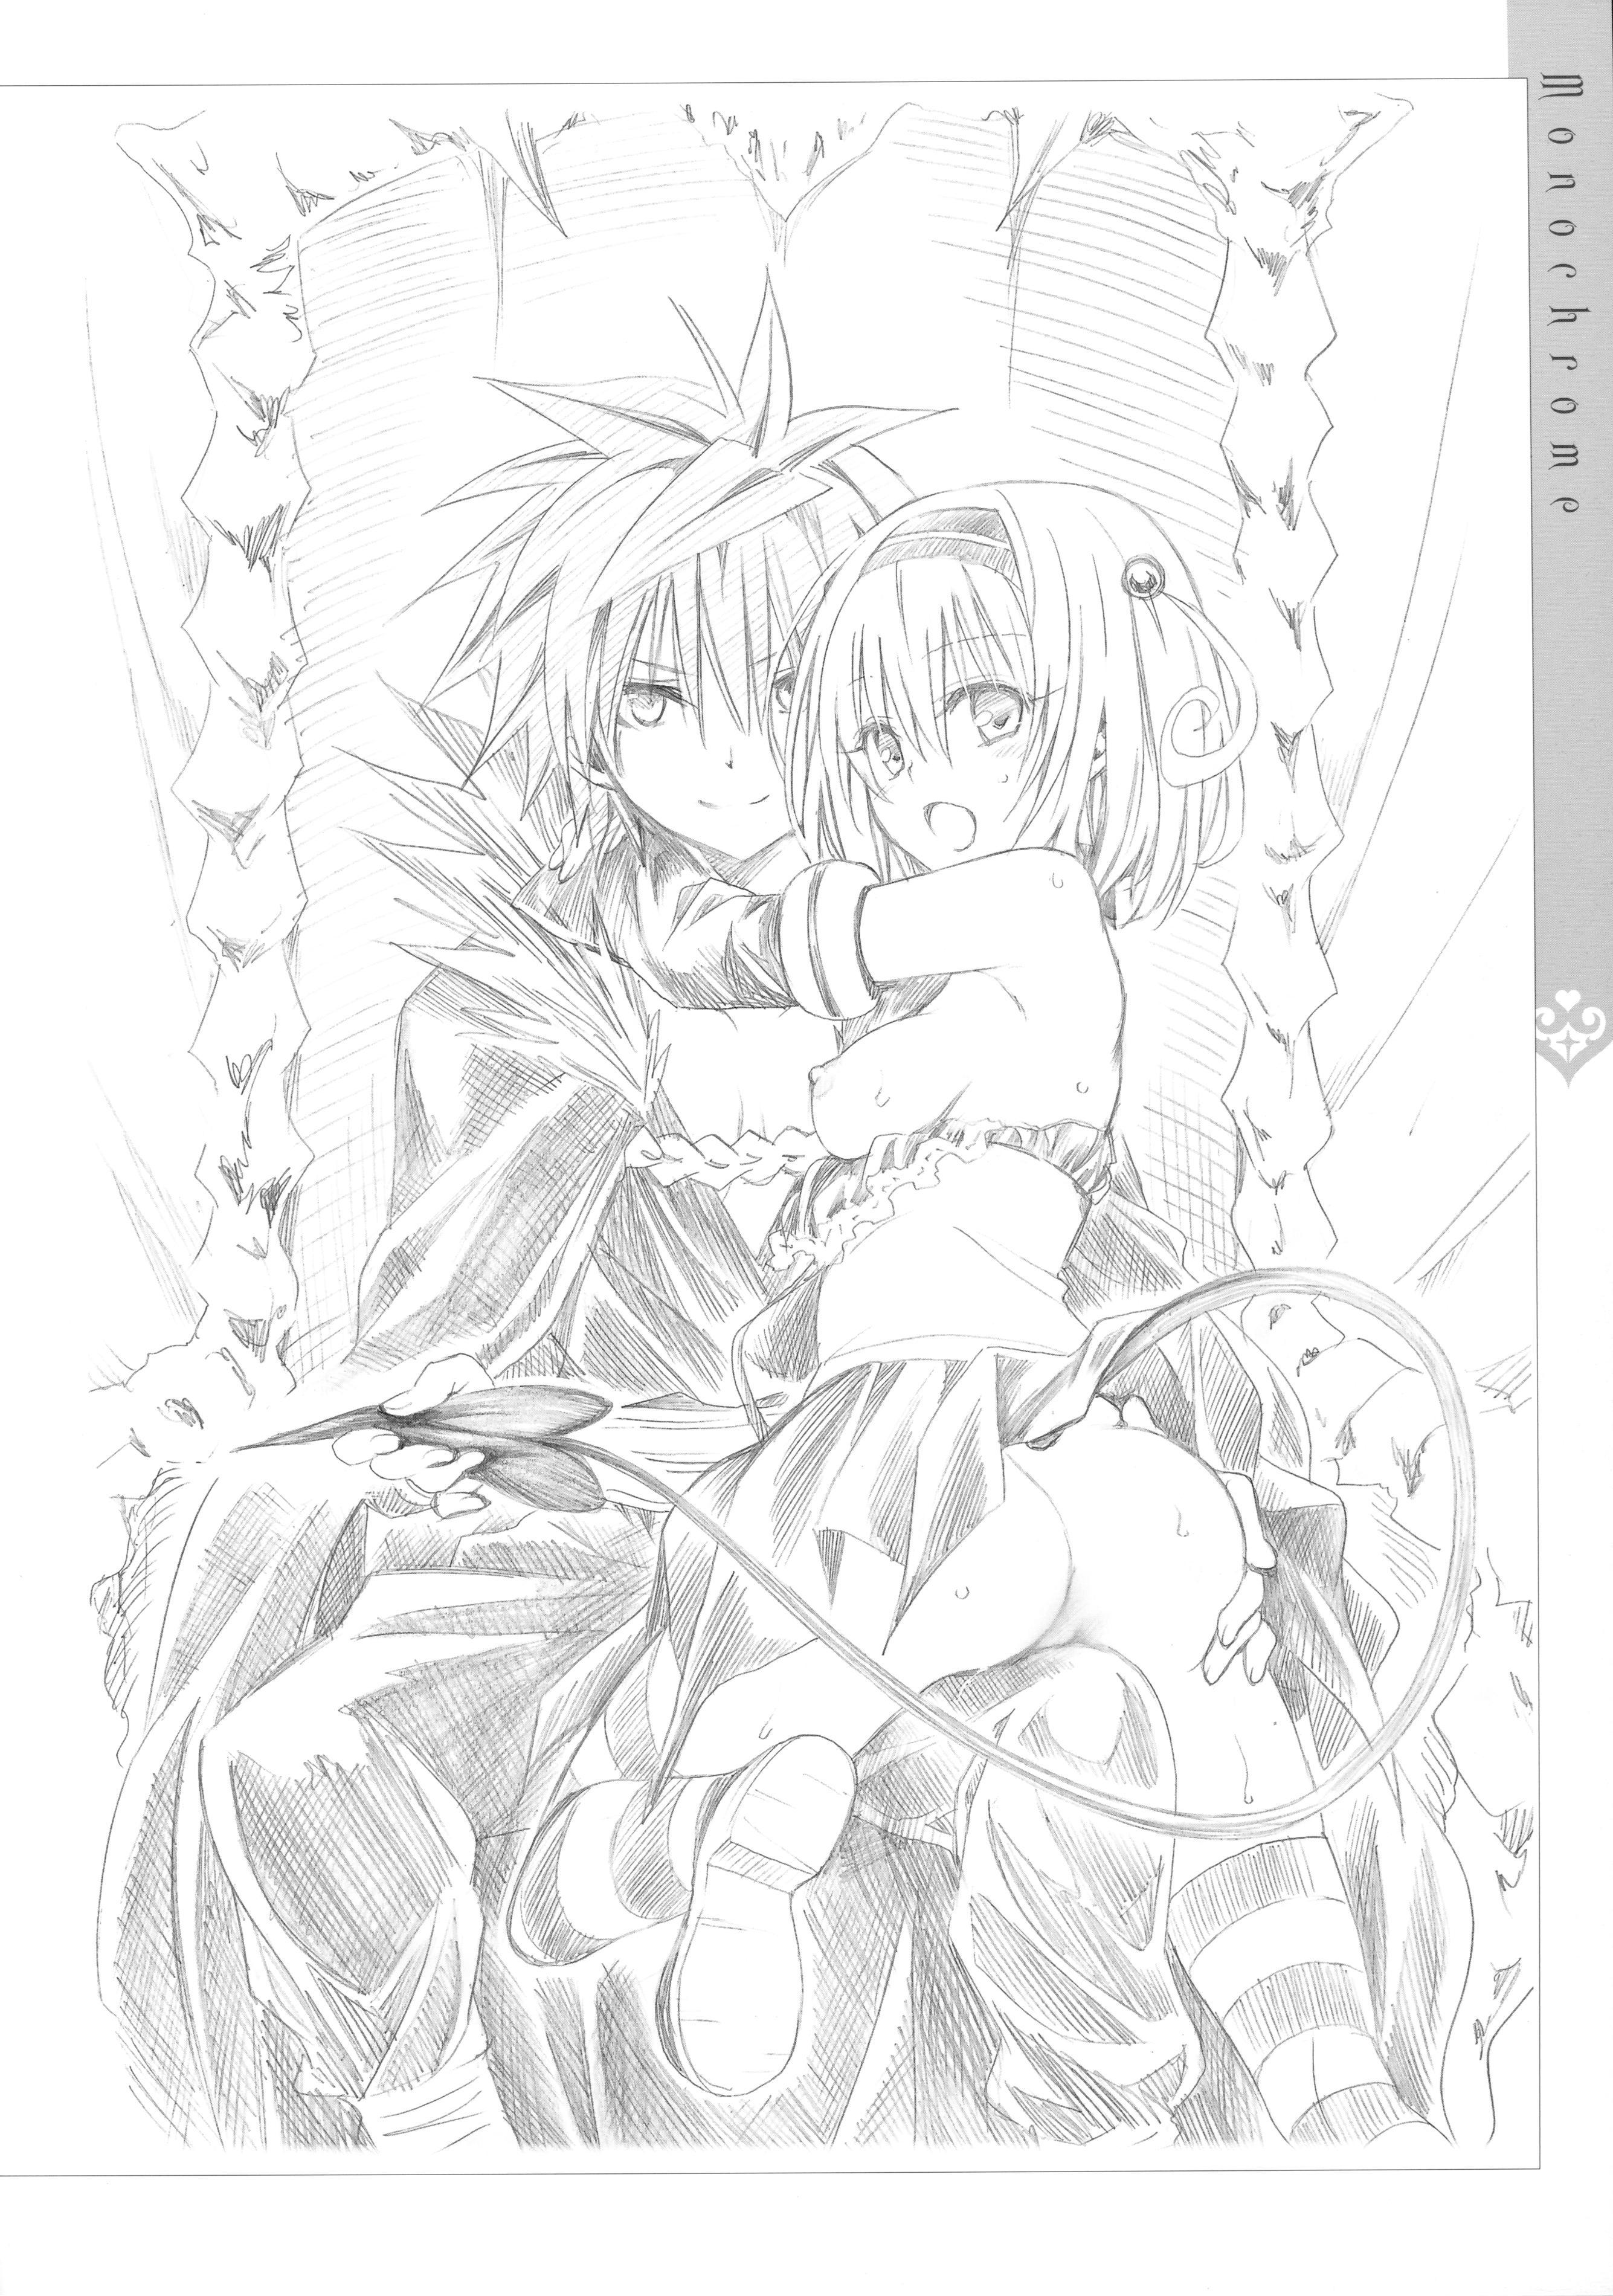 [Yabuki Kentaro] To Love-Ru -Trouble- Darkness Artbook Harem Gold 126